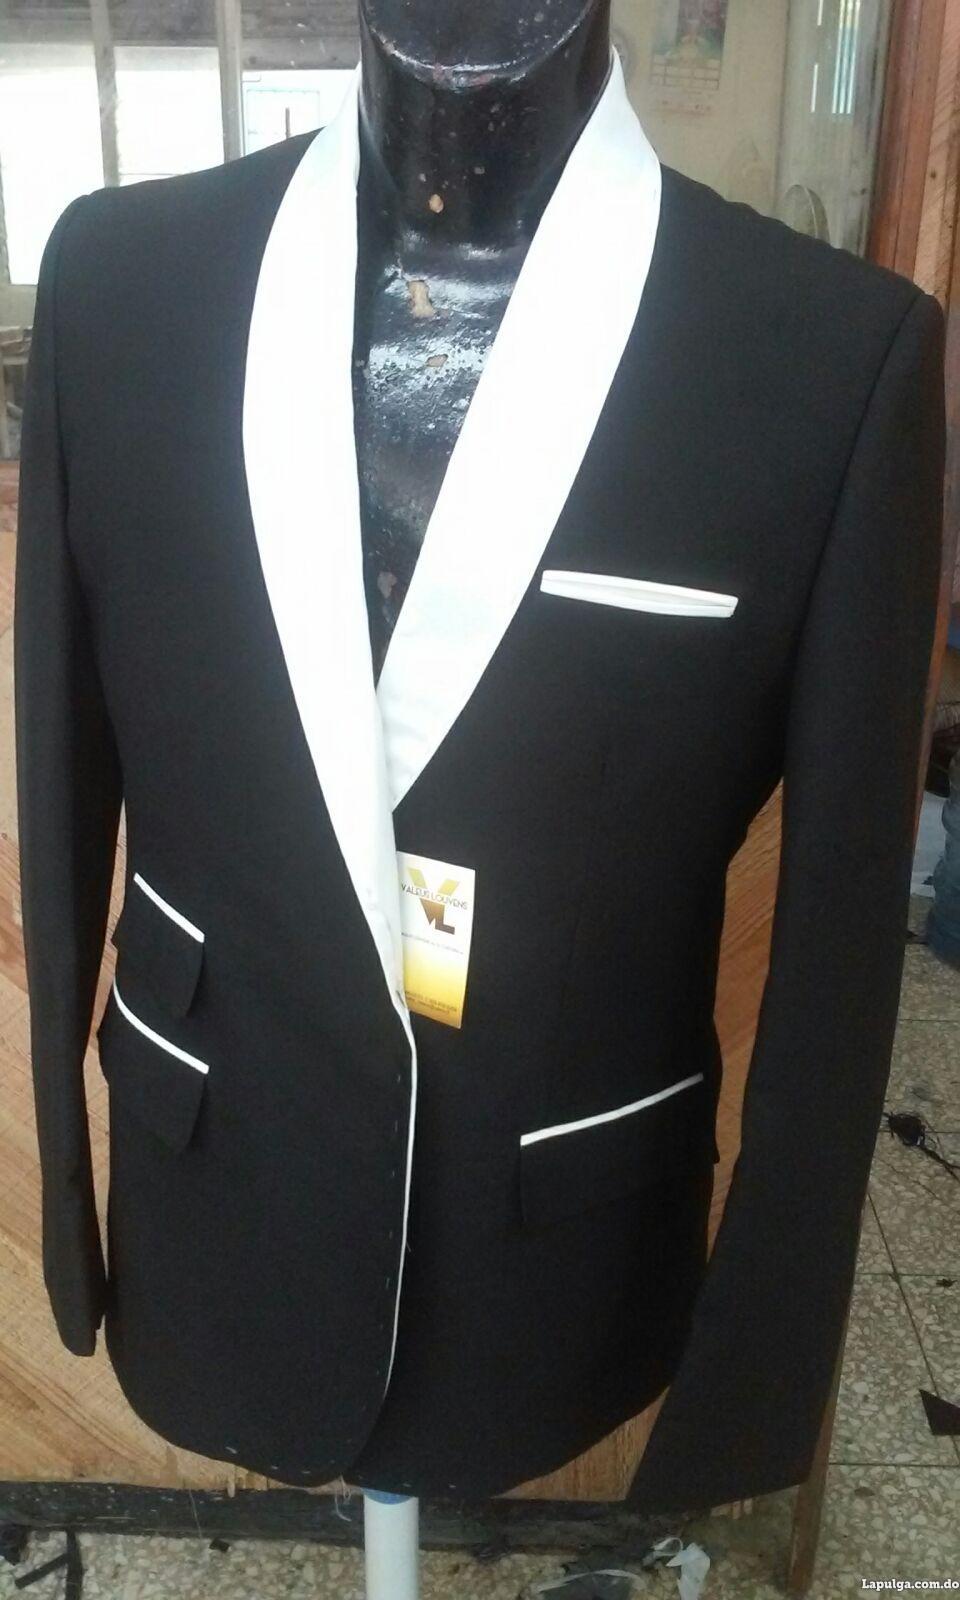 Alta Costura Traje Para Caballeros Mujeres Y Nios Y Mas Publicado.   05-Mar-2019 03 01 am. PrevNext e77c39a75da6